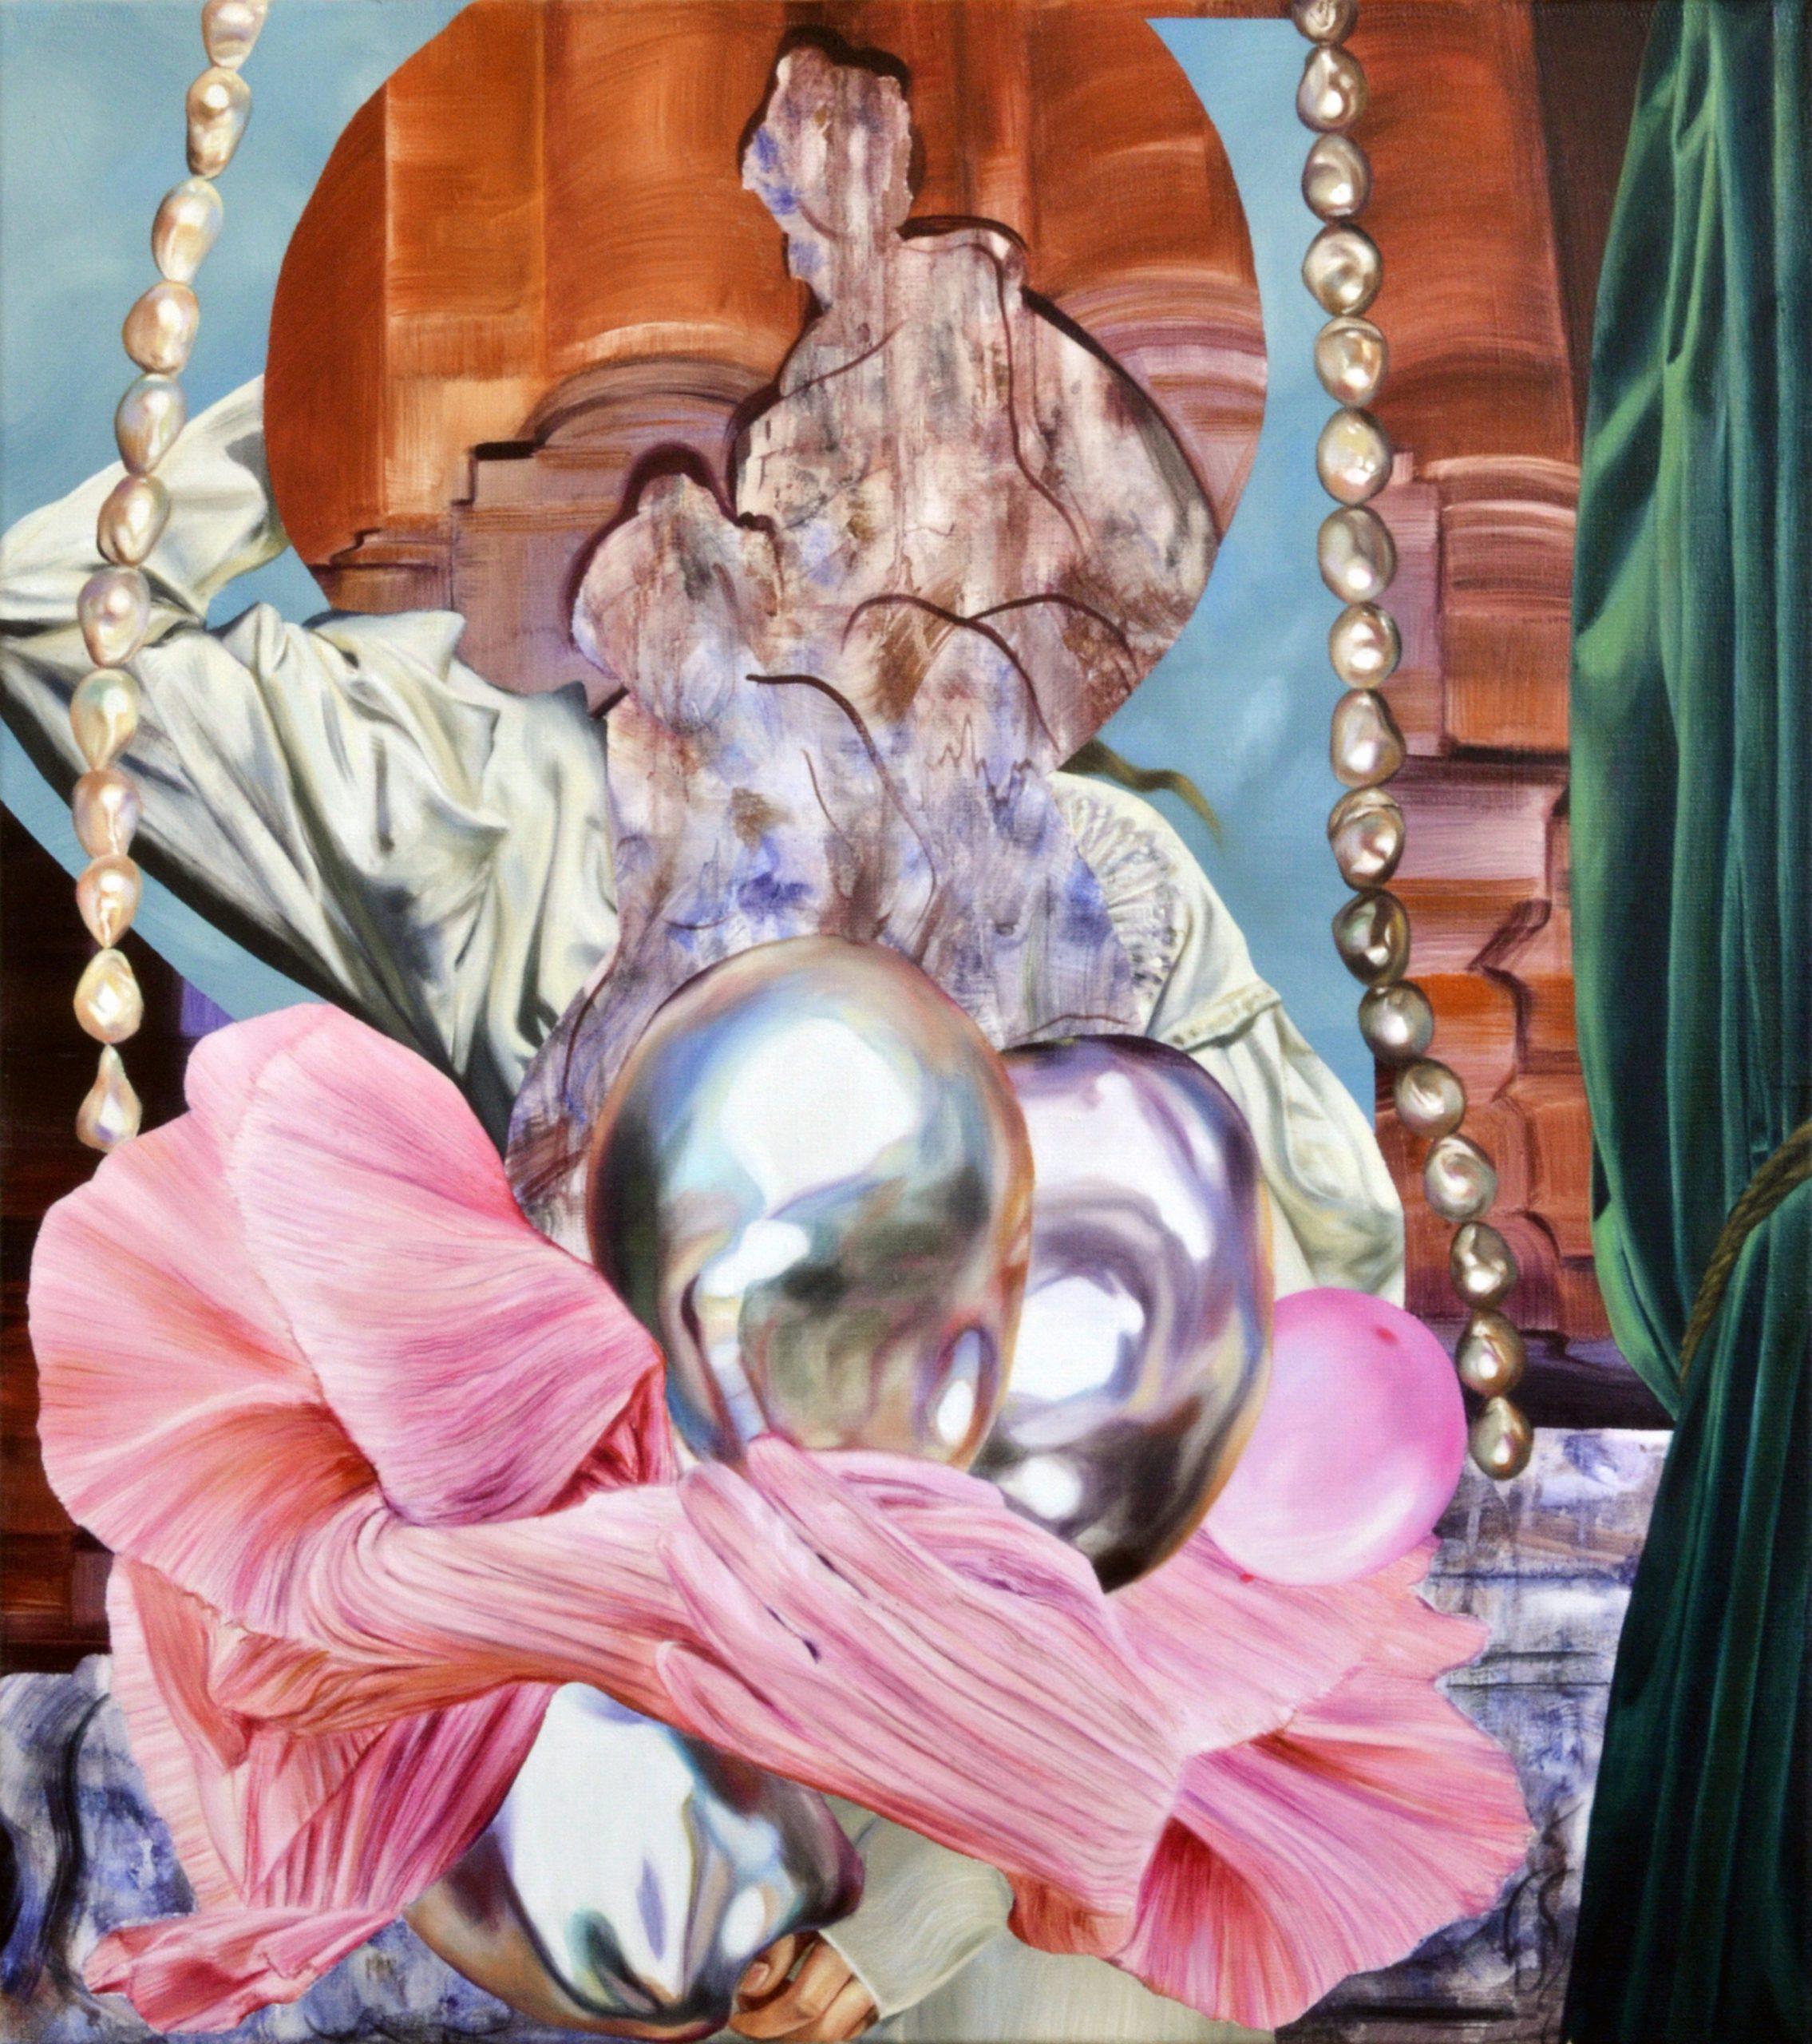 Martyna Borowiecka. Walking away in a dazzling glow. 90 x 80 cm. Oil on canvas. 2019